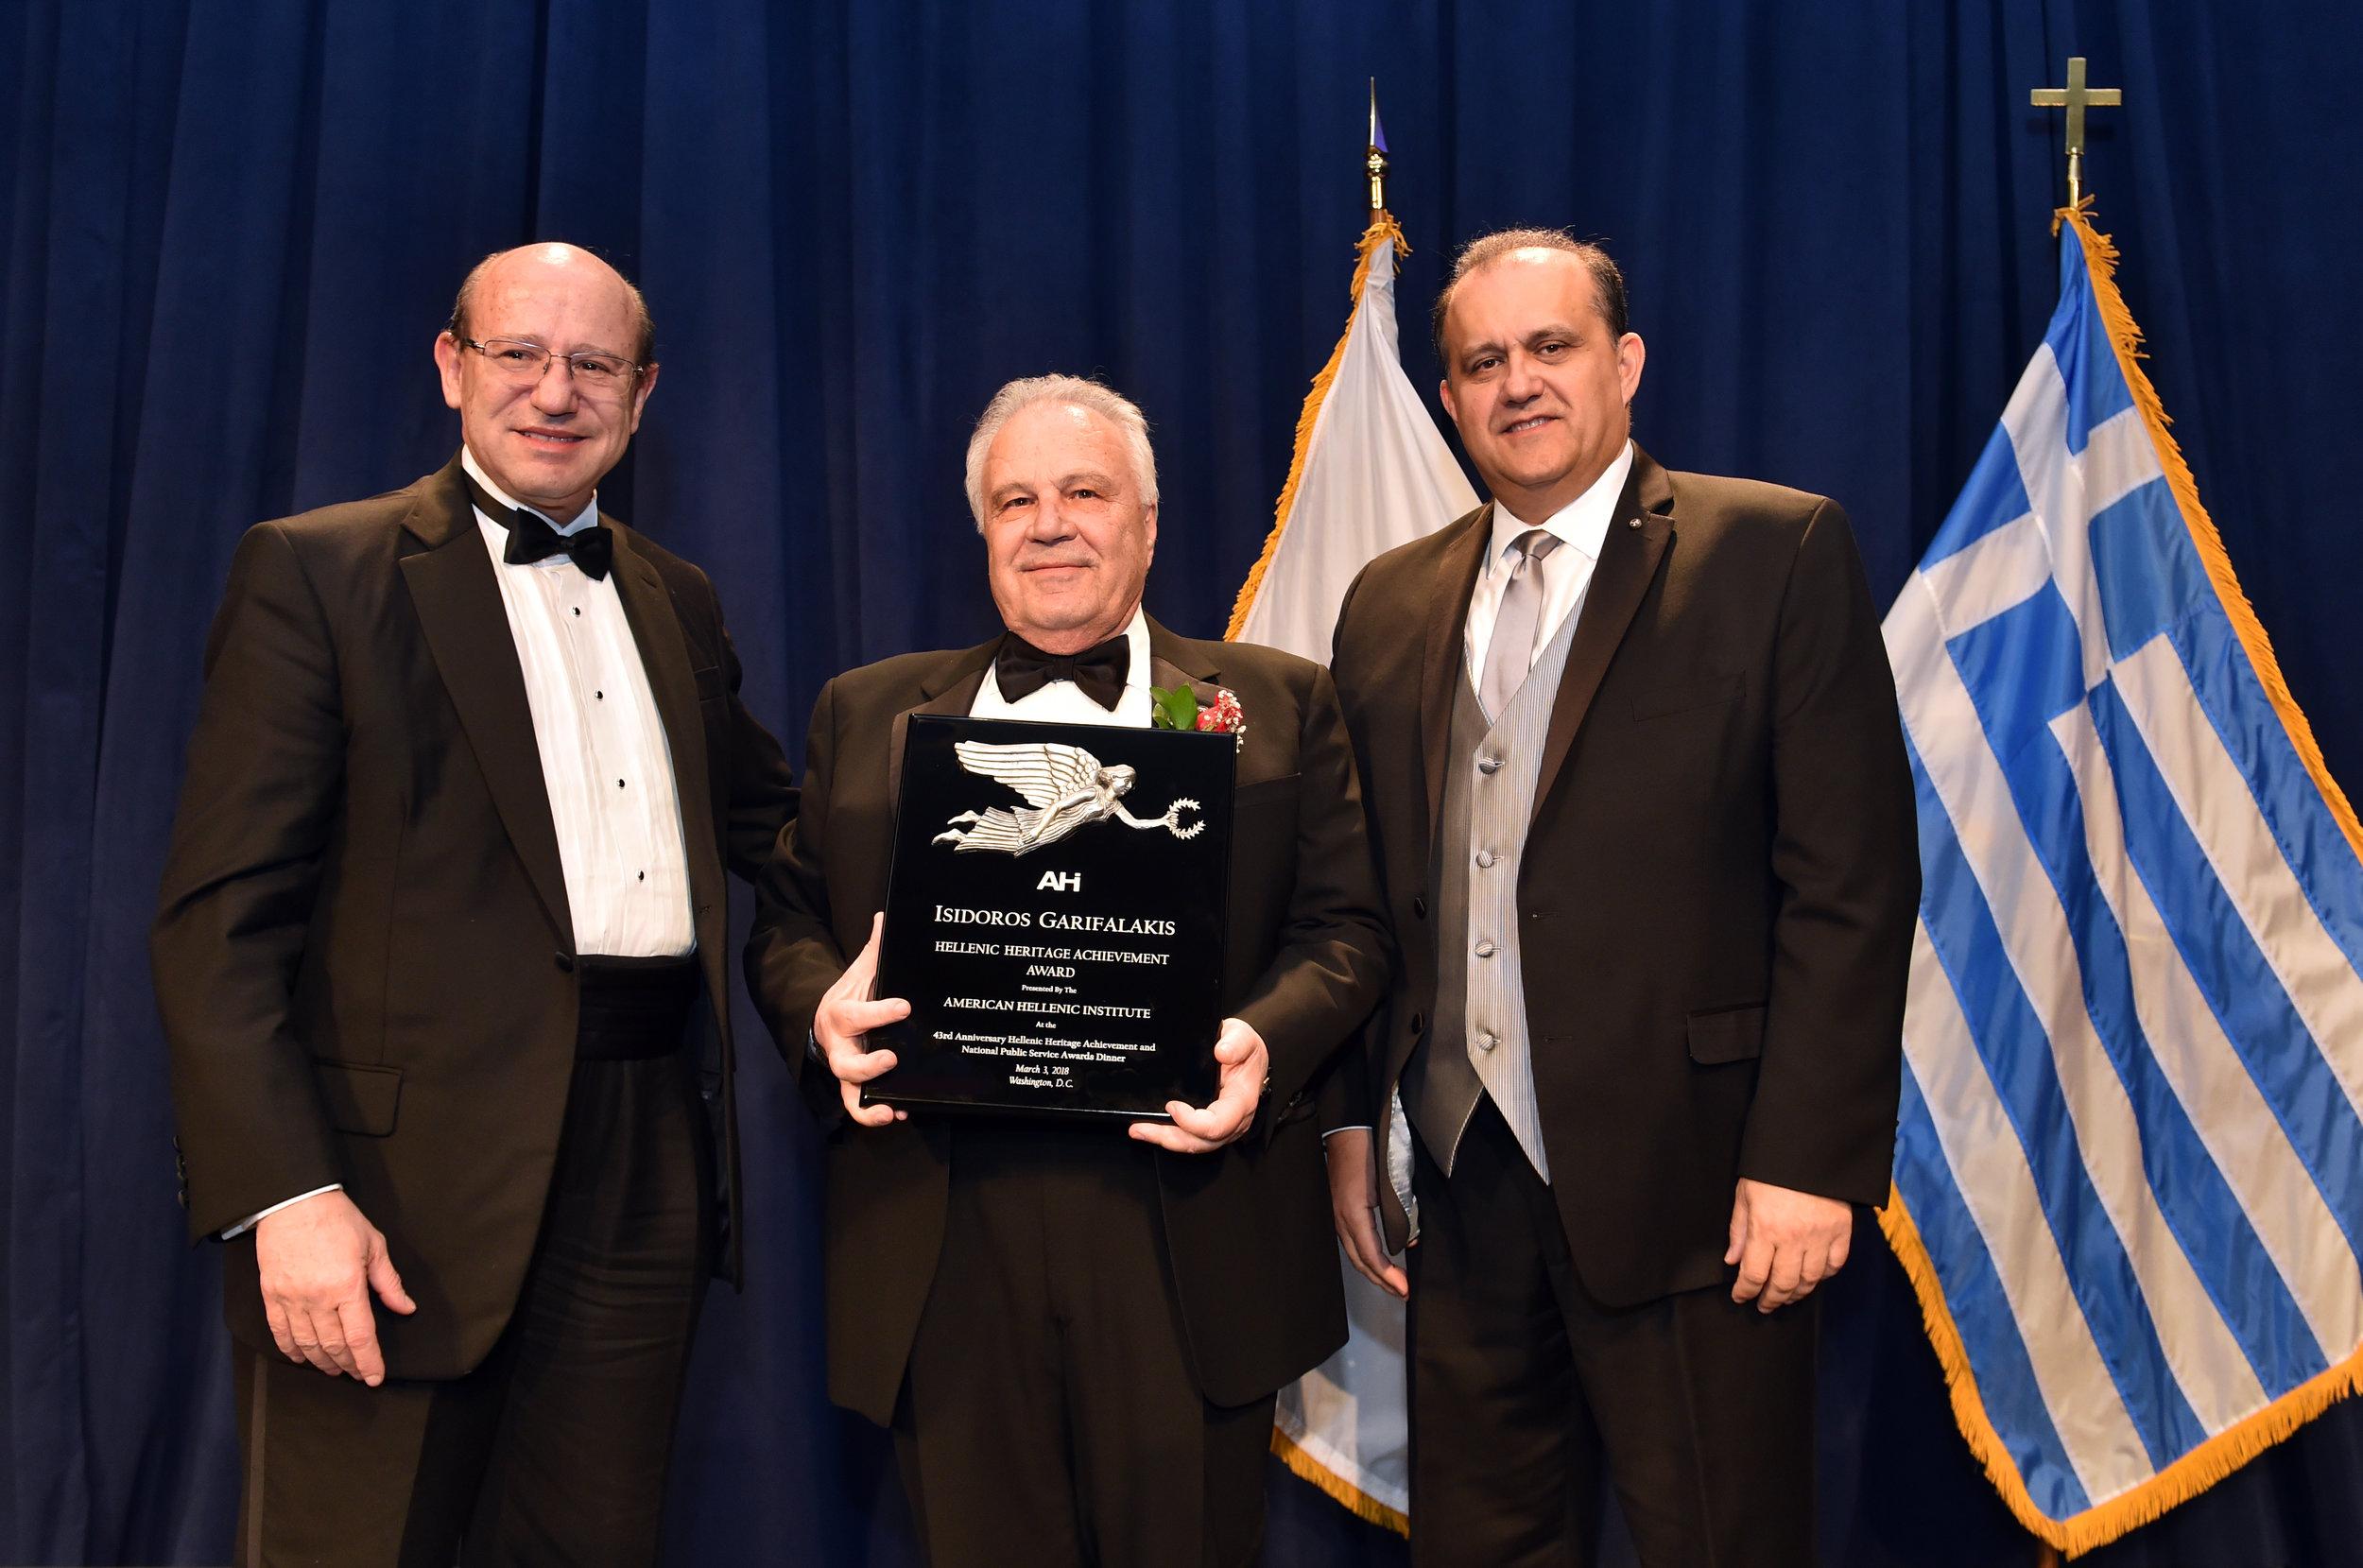 Isidoros Garifalakis receives the AHI Hellenic Heritage Achievement Award.